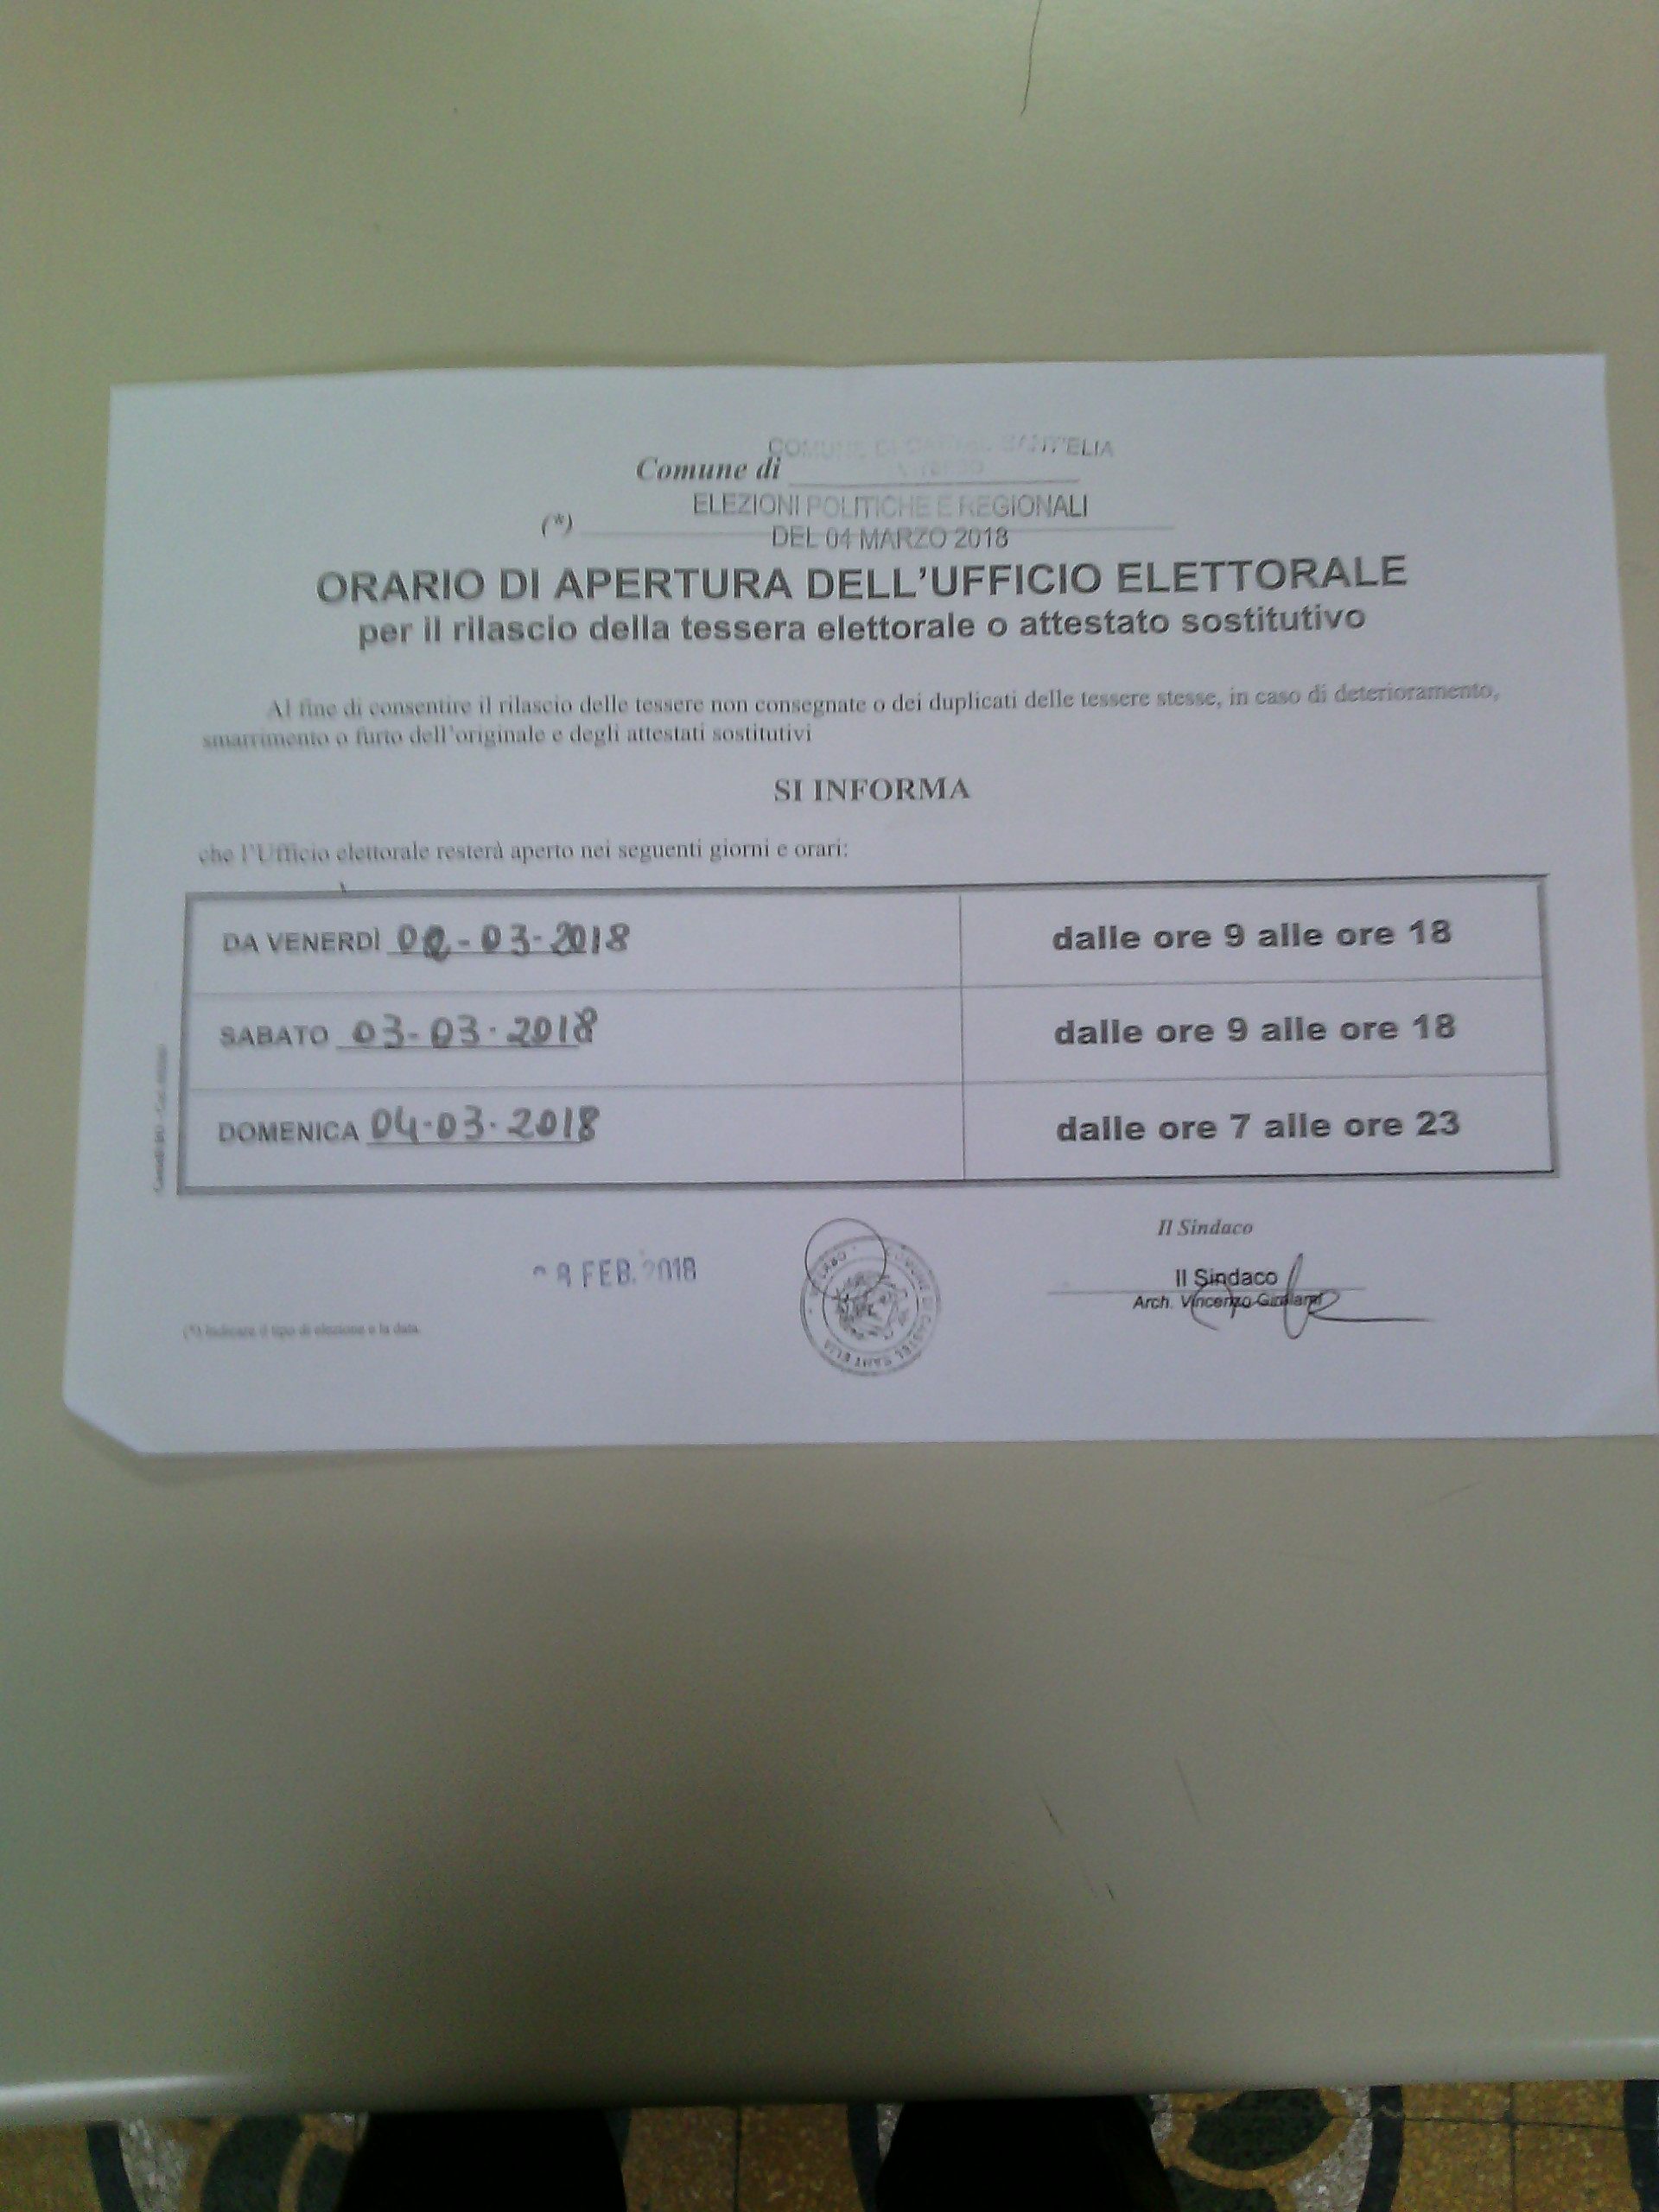 UFFICI ELETTORALI ORARI APERTURA STRAORDINARIAA